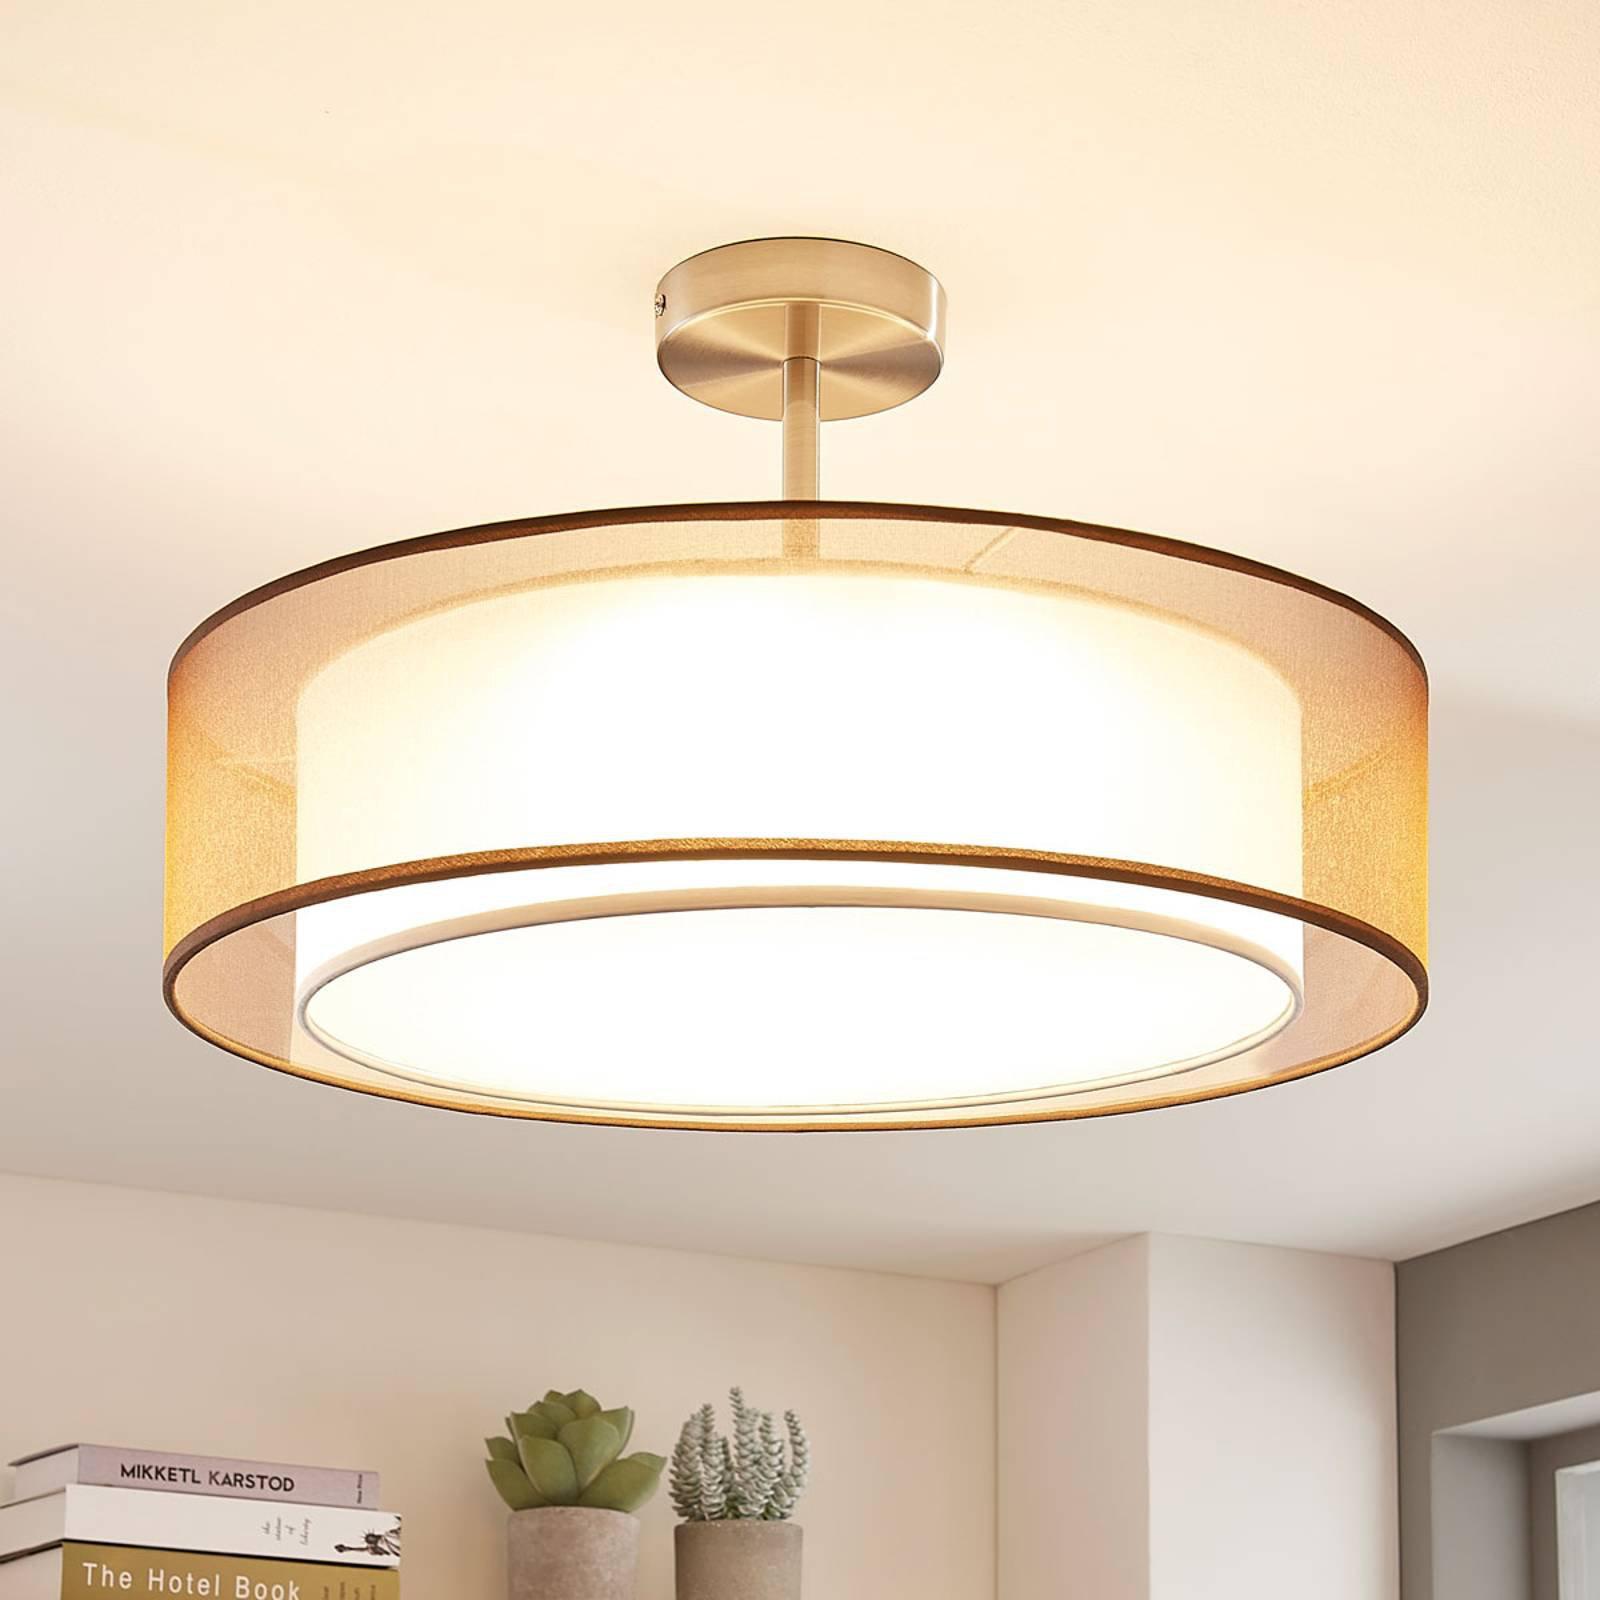 LED-taklampe Pikka, 3-trinns dimbar, brun